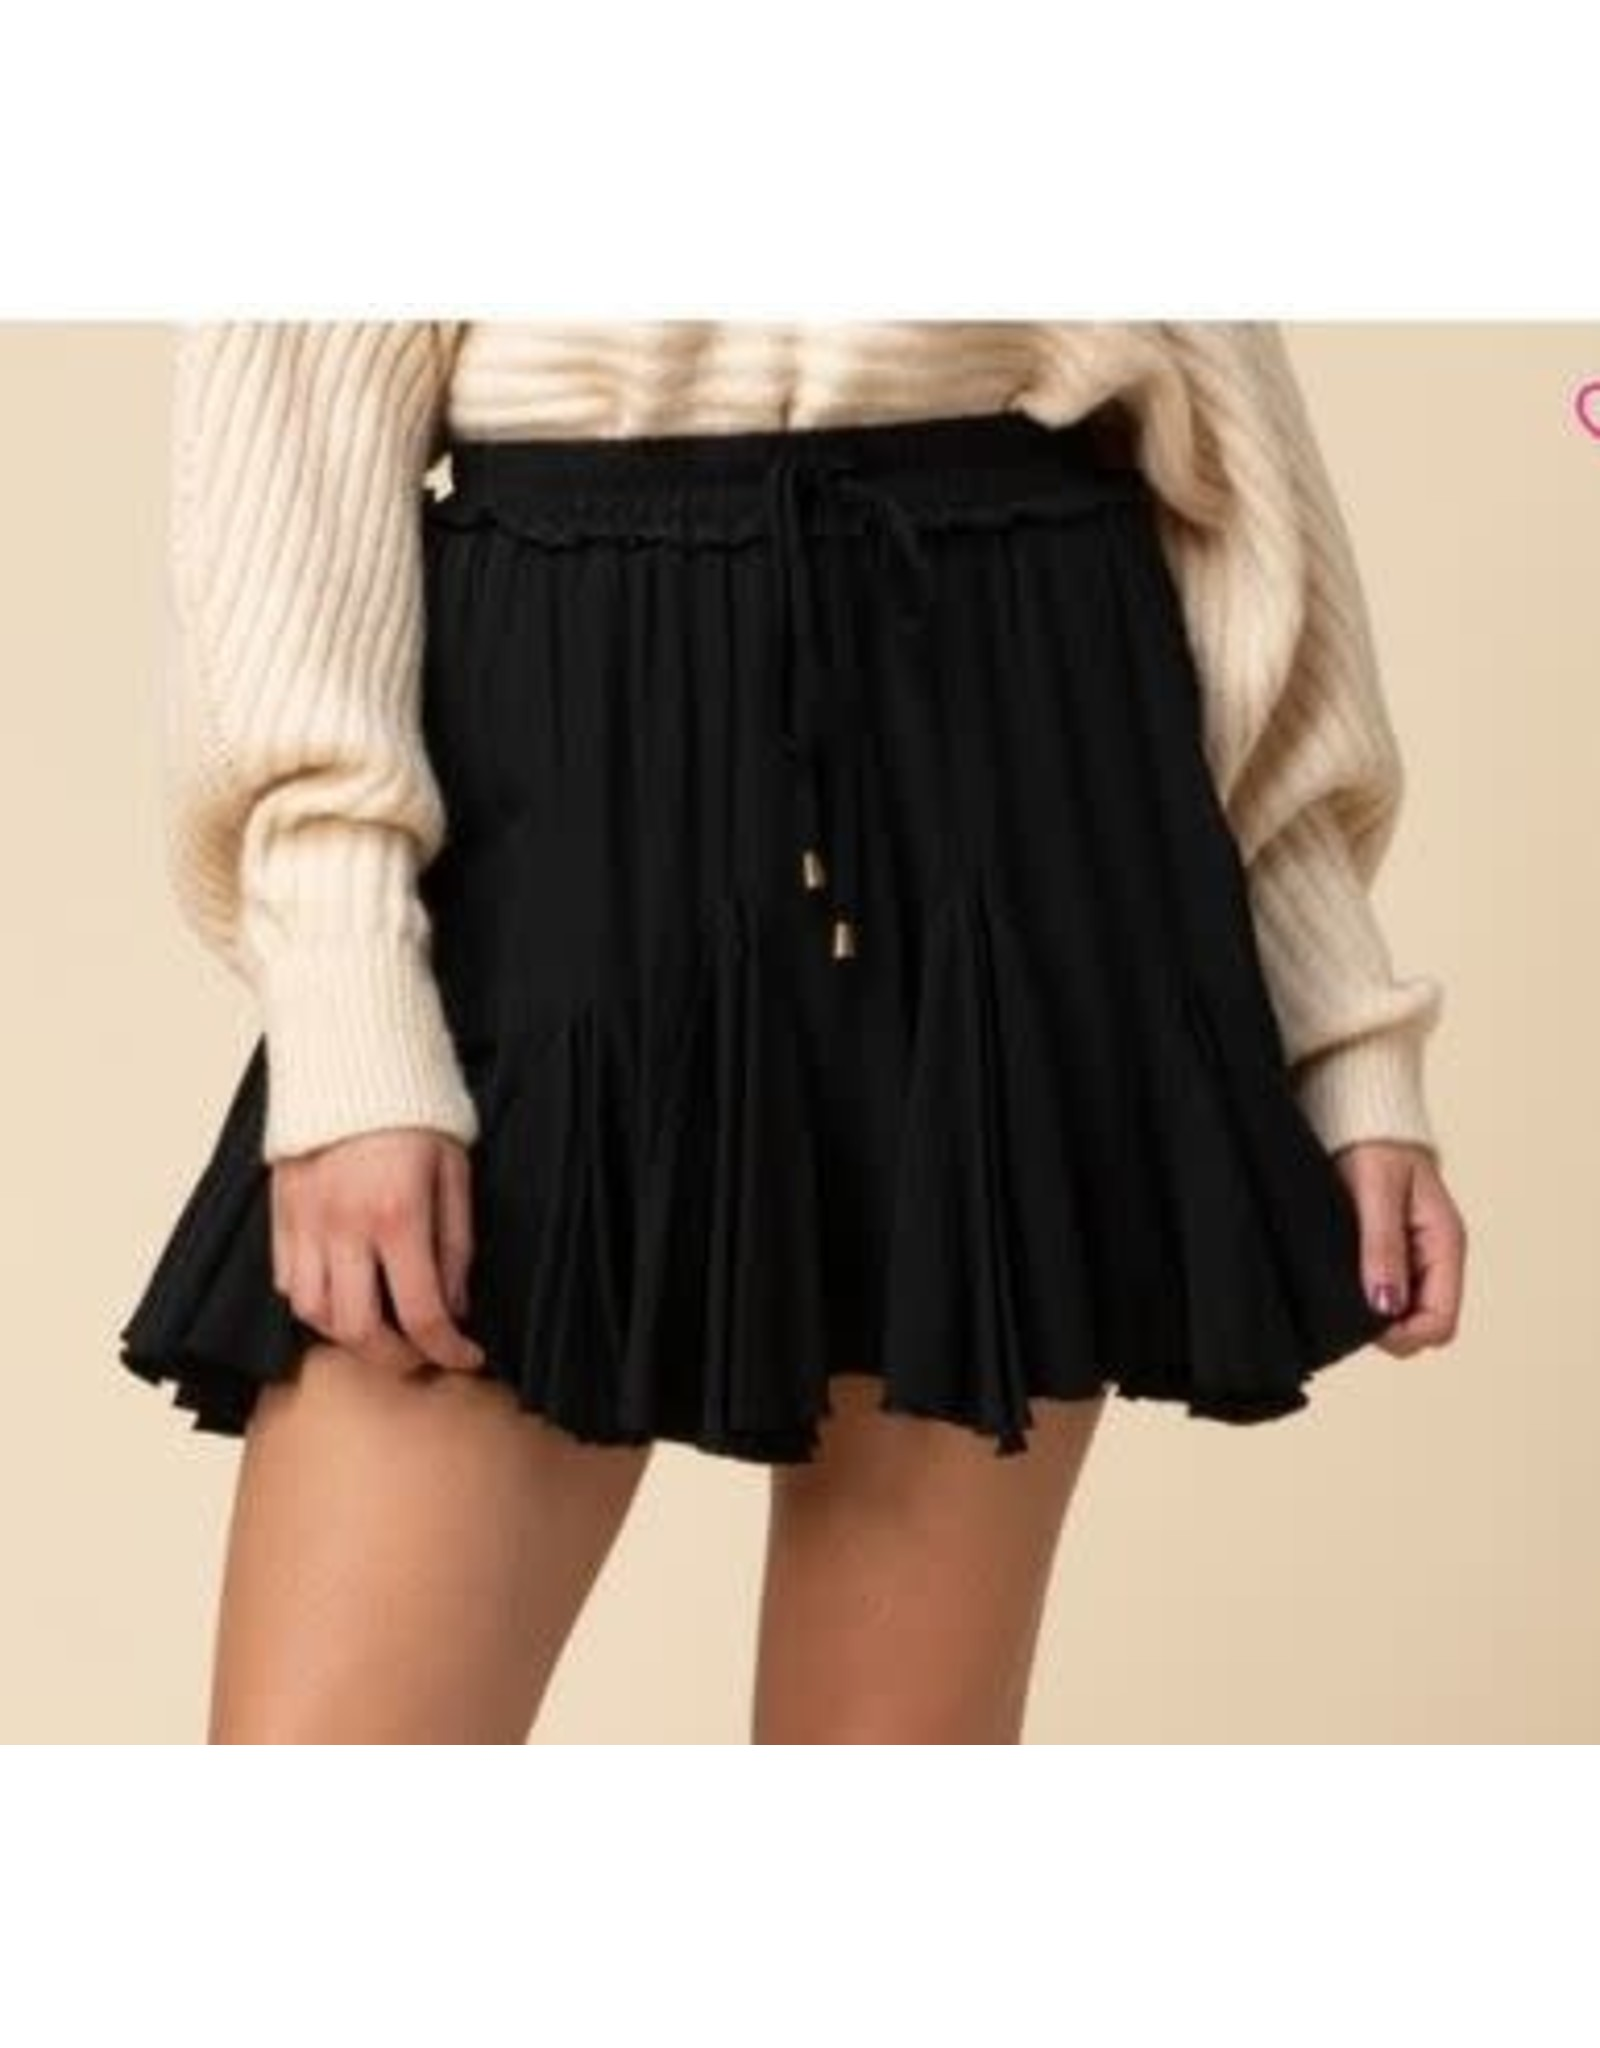 Entro Black Ruffle Skirt